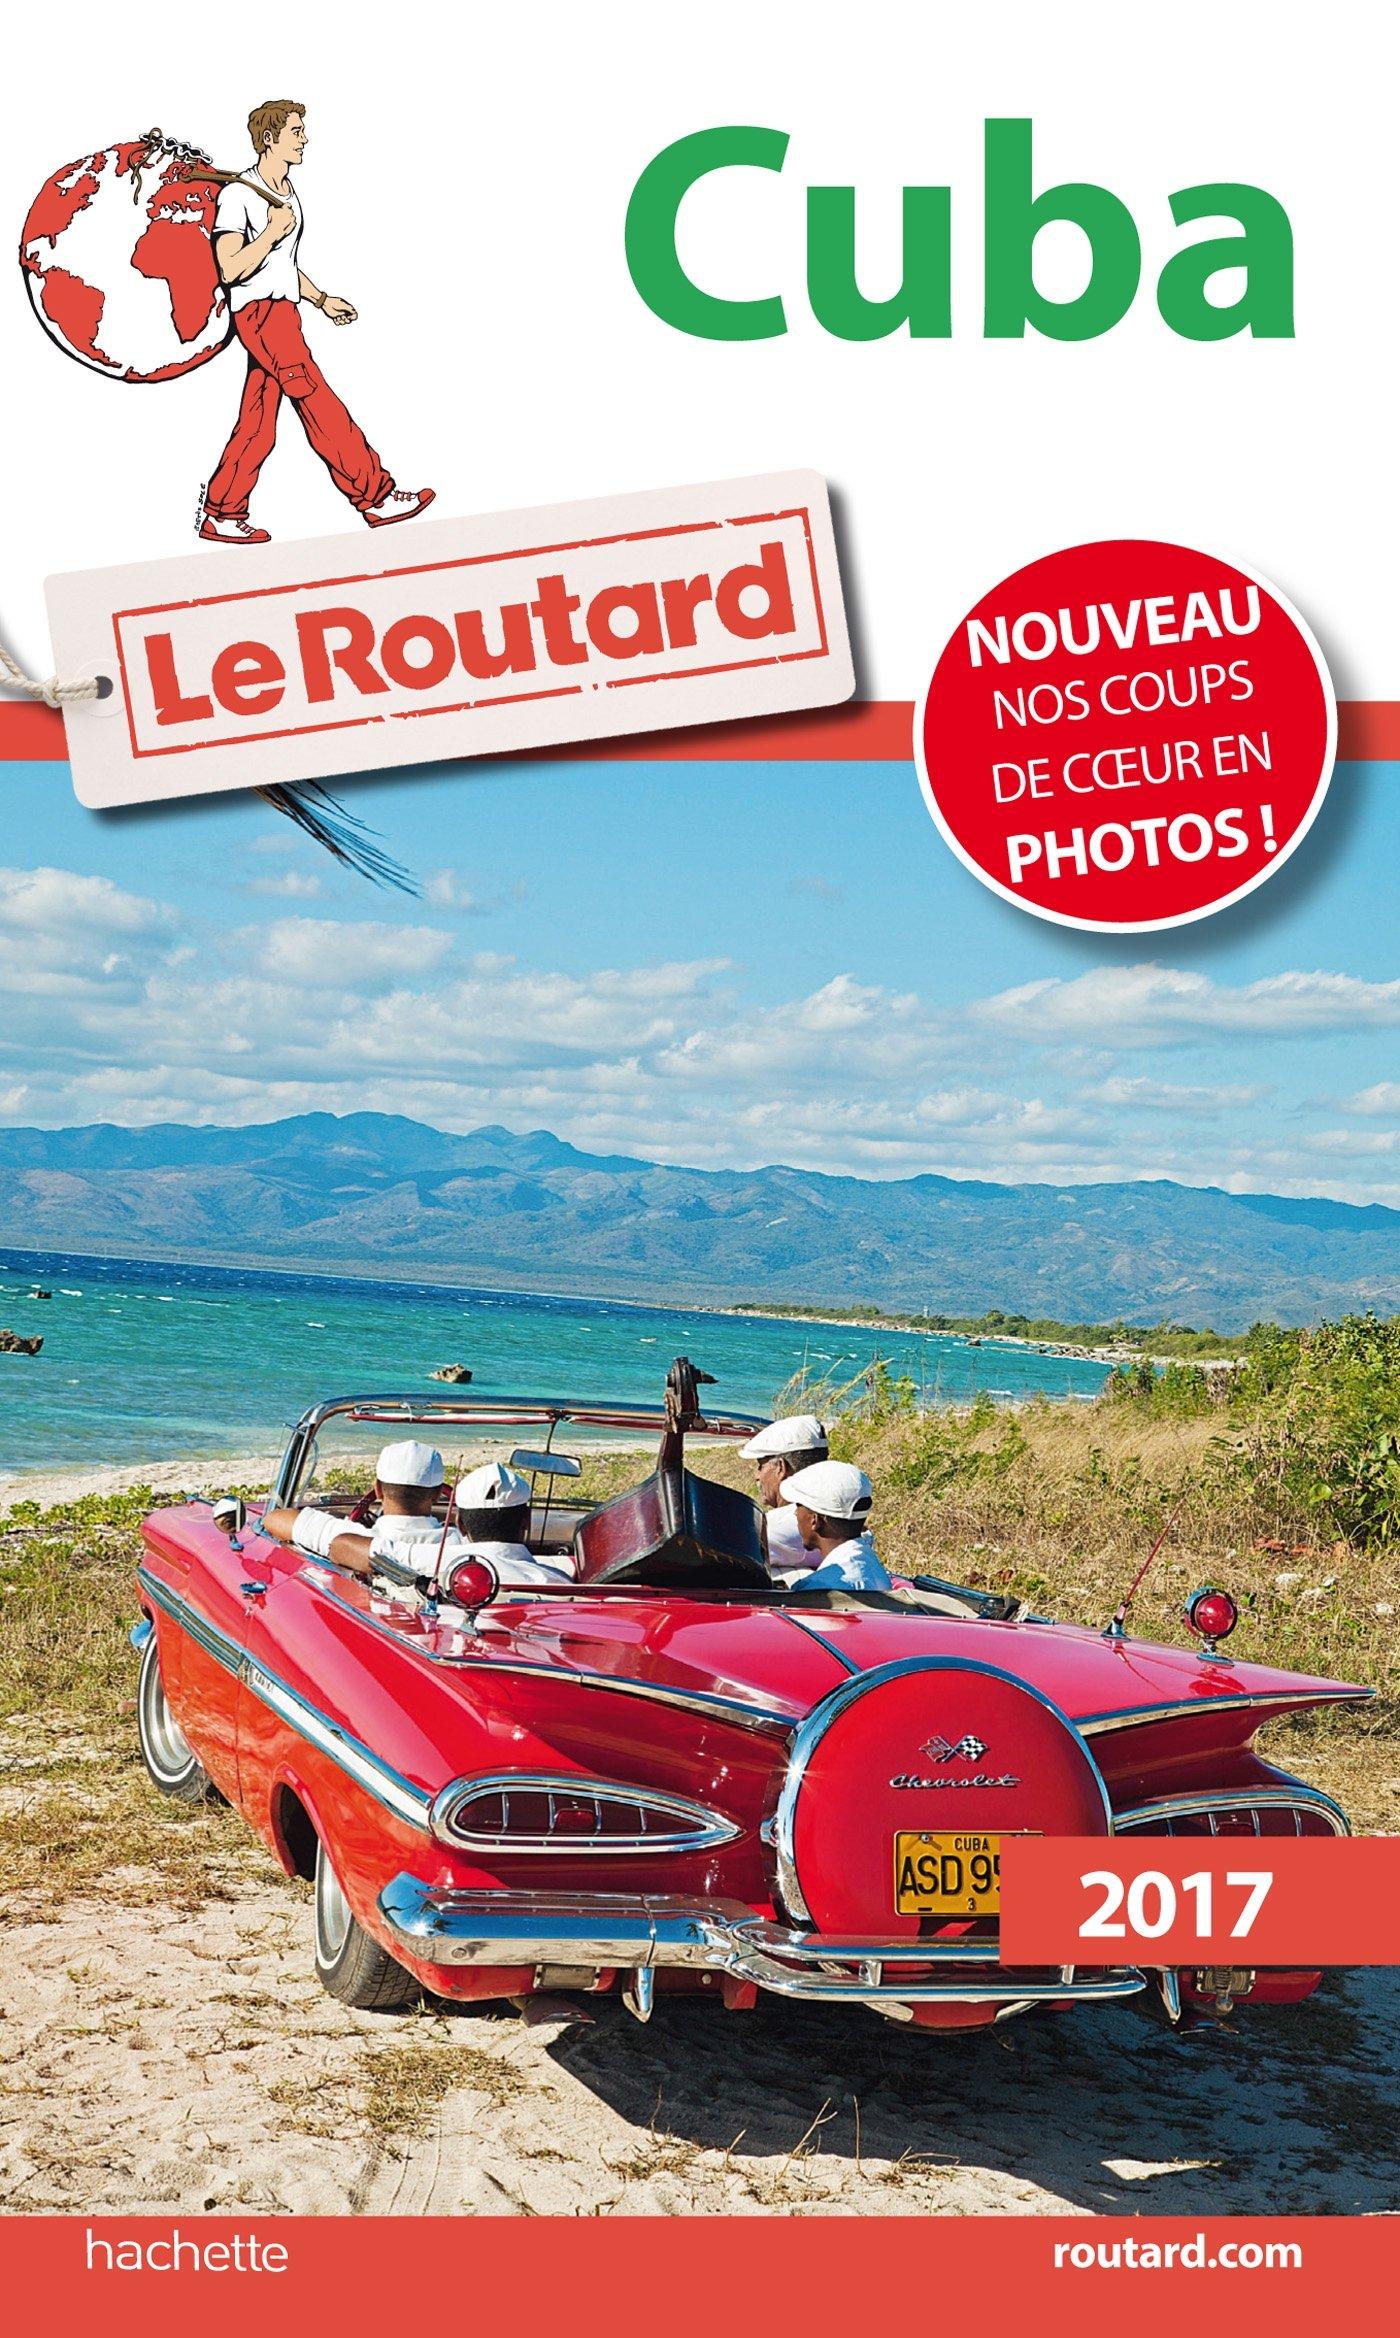 Carte Cuba Guide Du Routard.Amazon Fr Guide Du Routard Cuba 2017 Collectif Livres